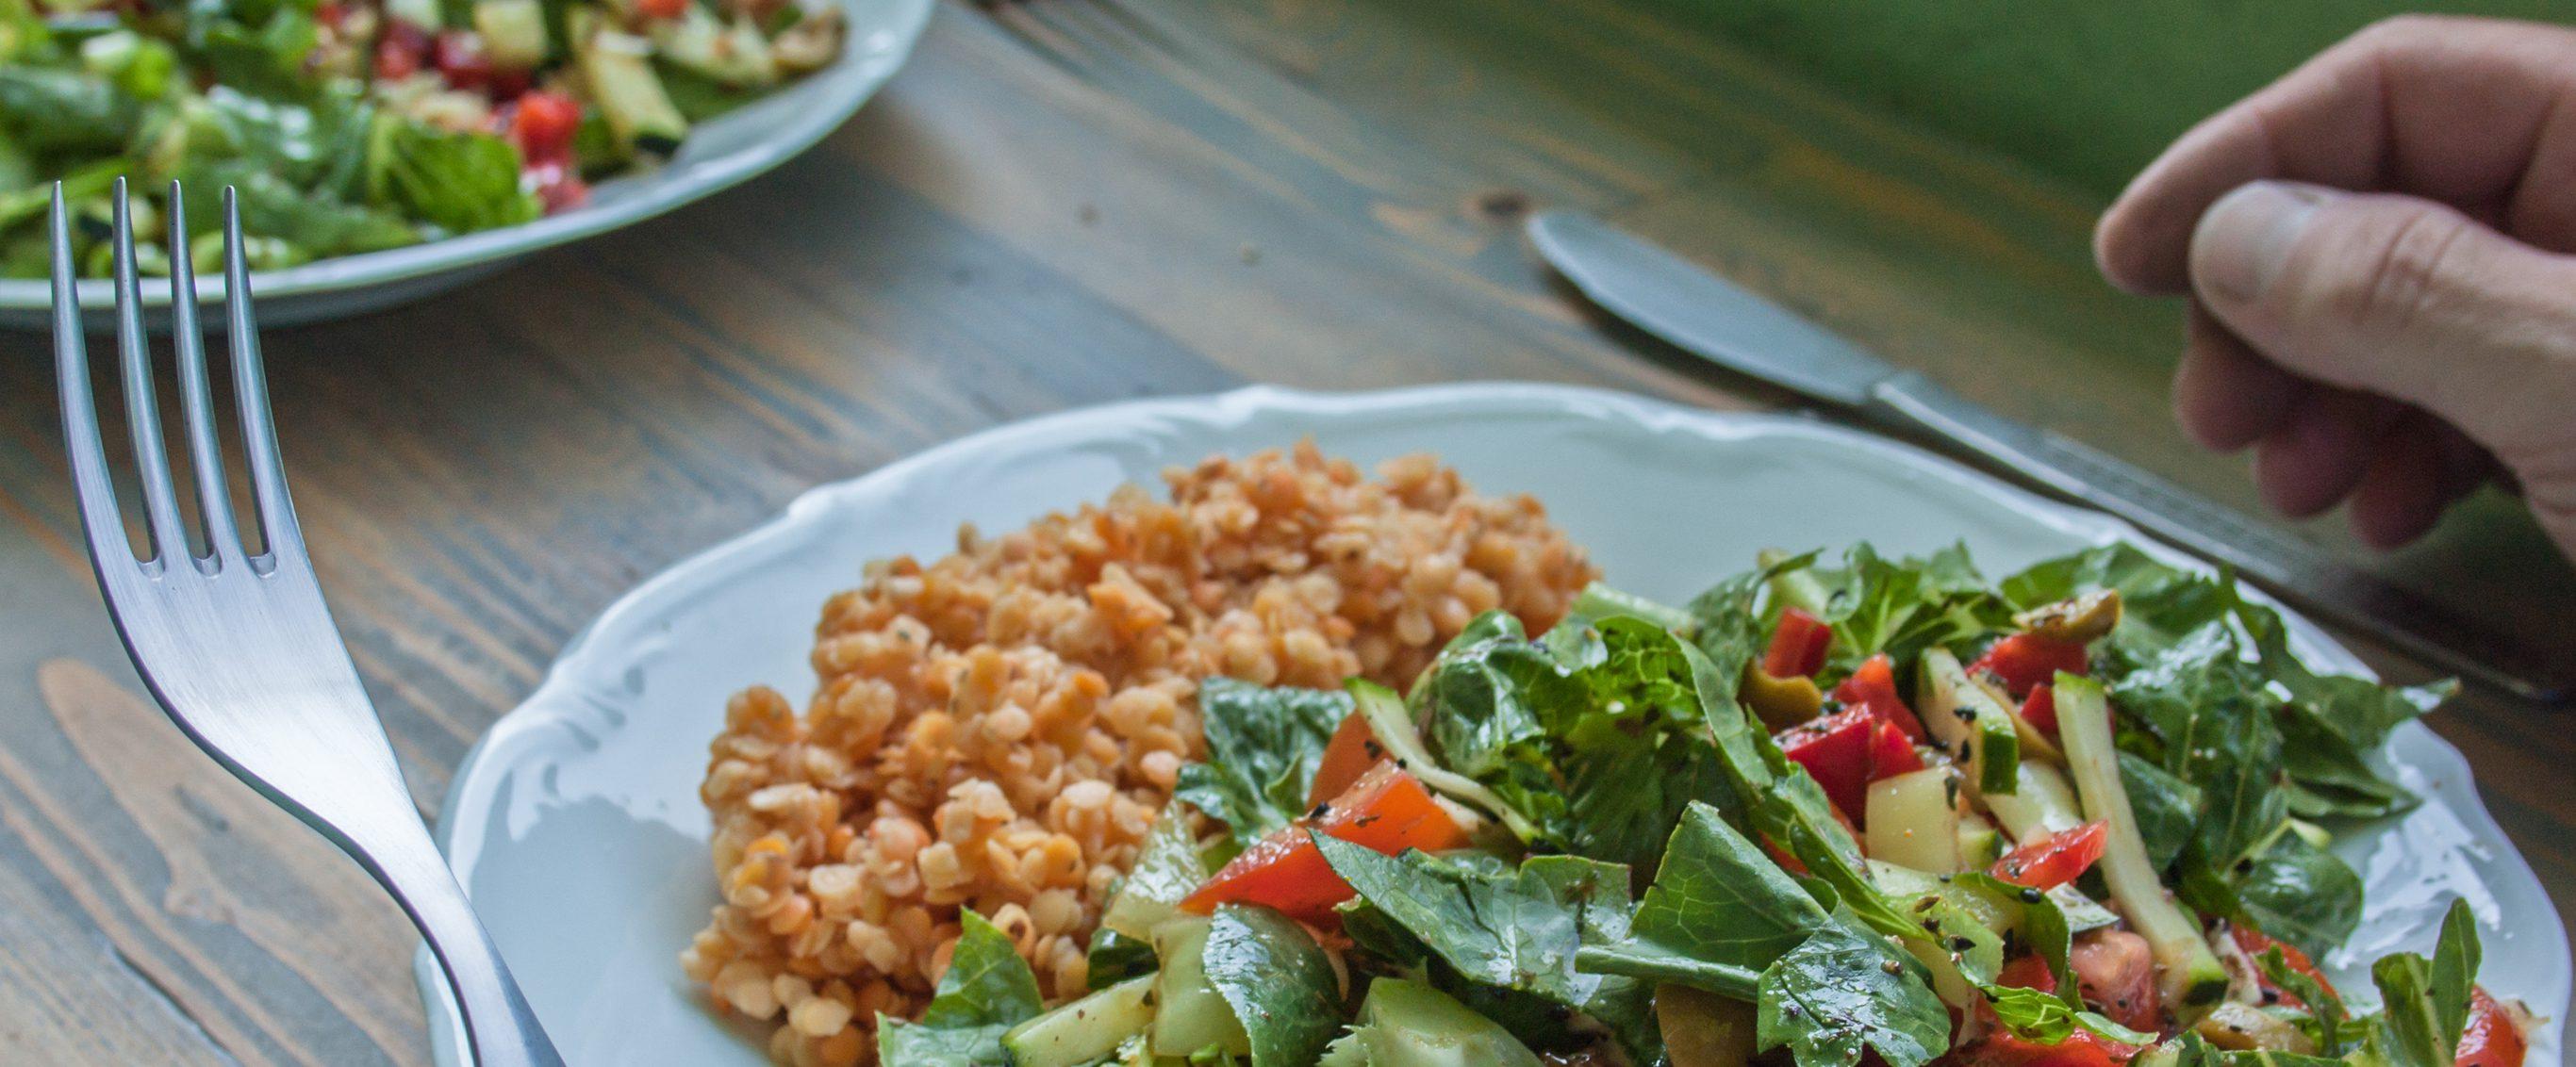 lentils and salad